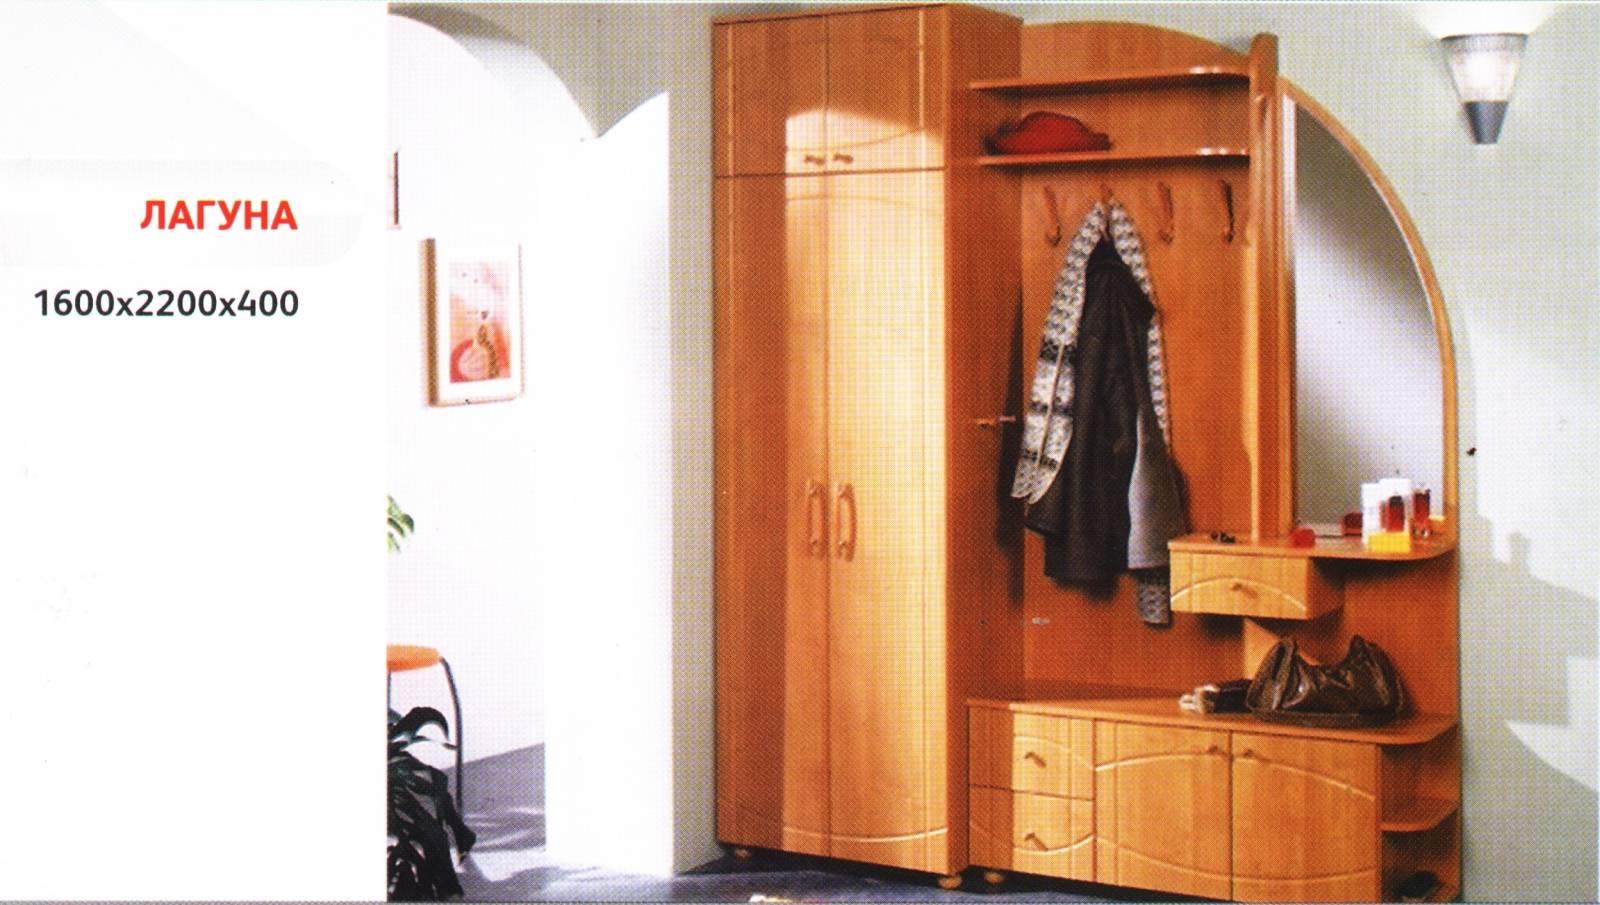 Дизайн коридора в квартире - 100 фото идей и новинок.